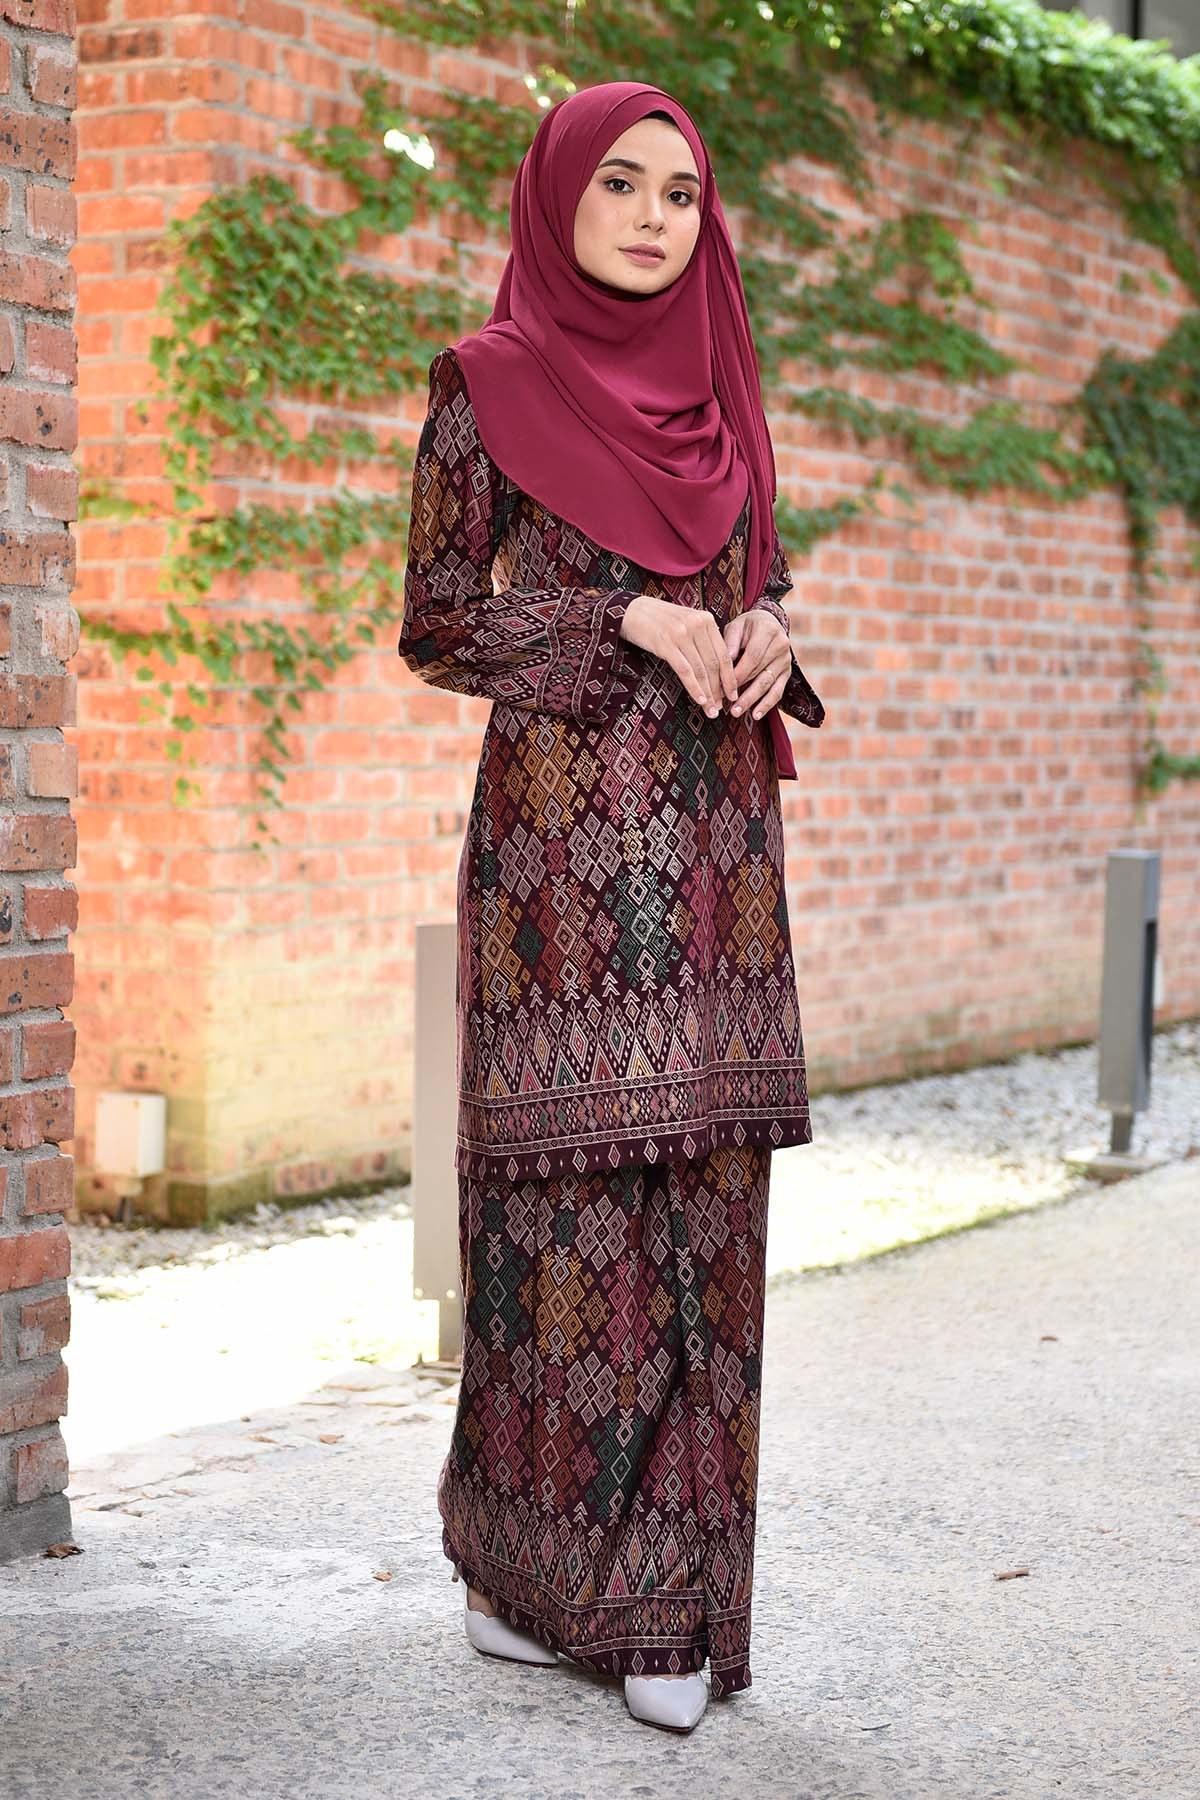 Inspirasi Model Kebaya Bridesmaid Hijab O2d5 Baju Kurung songket Luella Deep Maroon